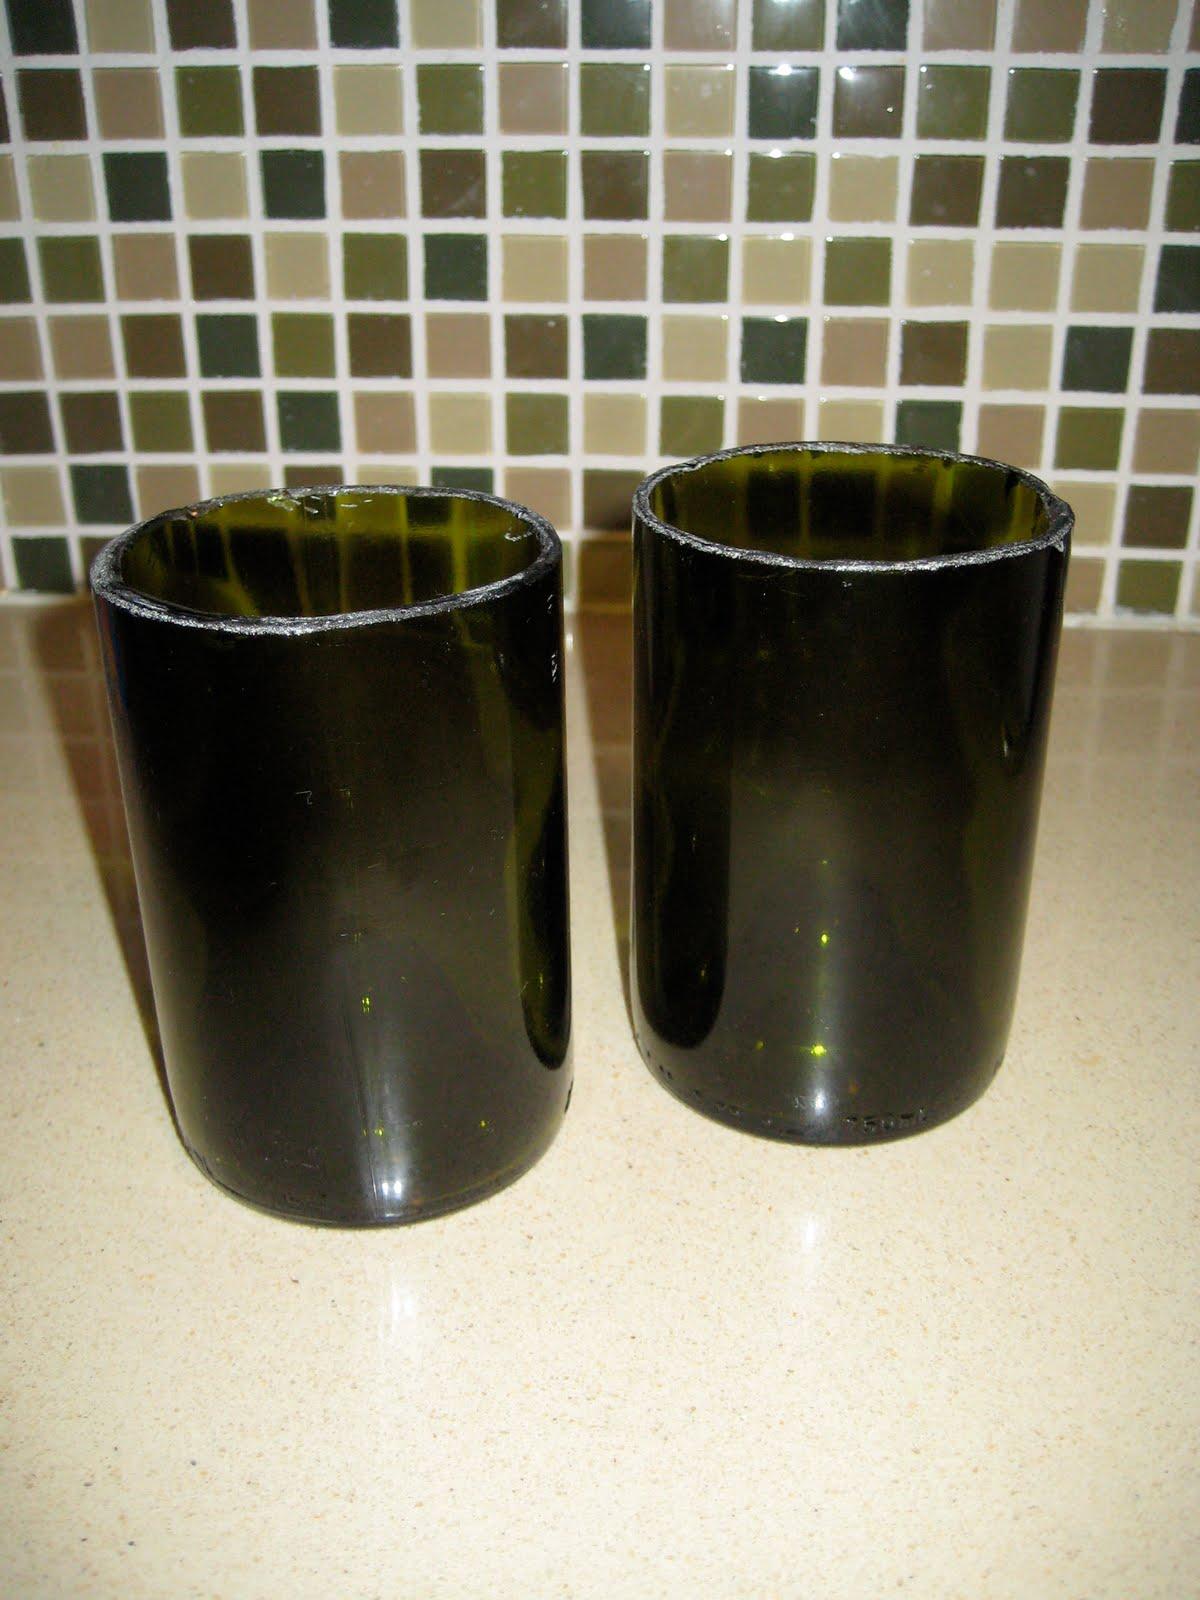 Adventures in creating diy for Wine bottle glasses diy